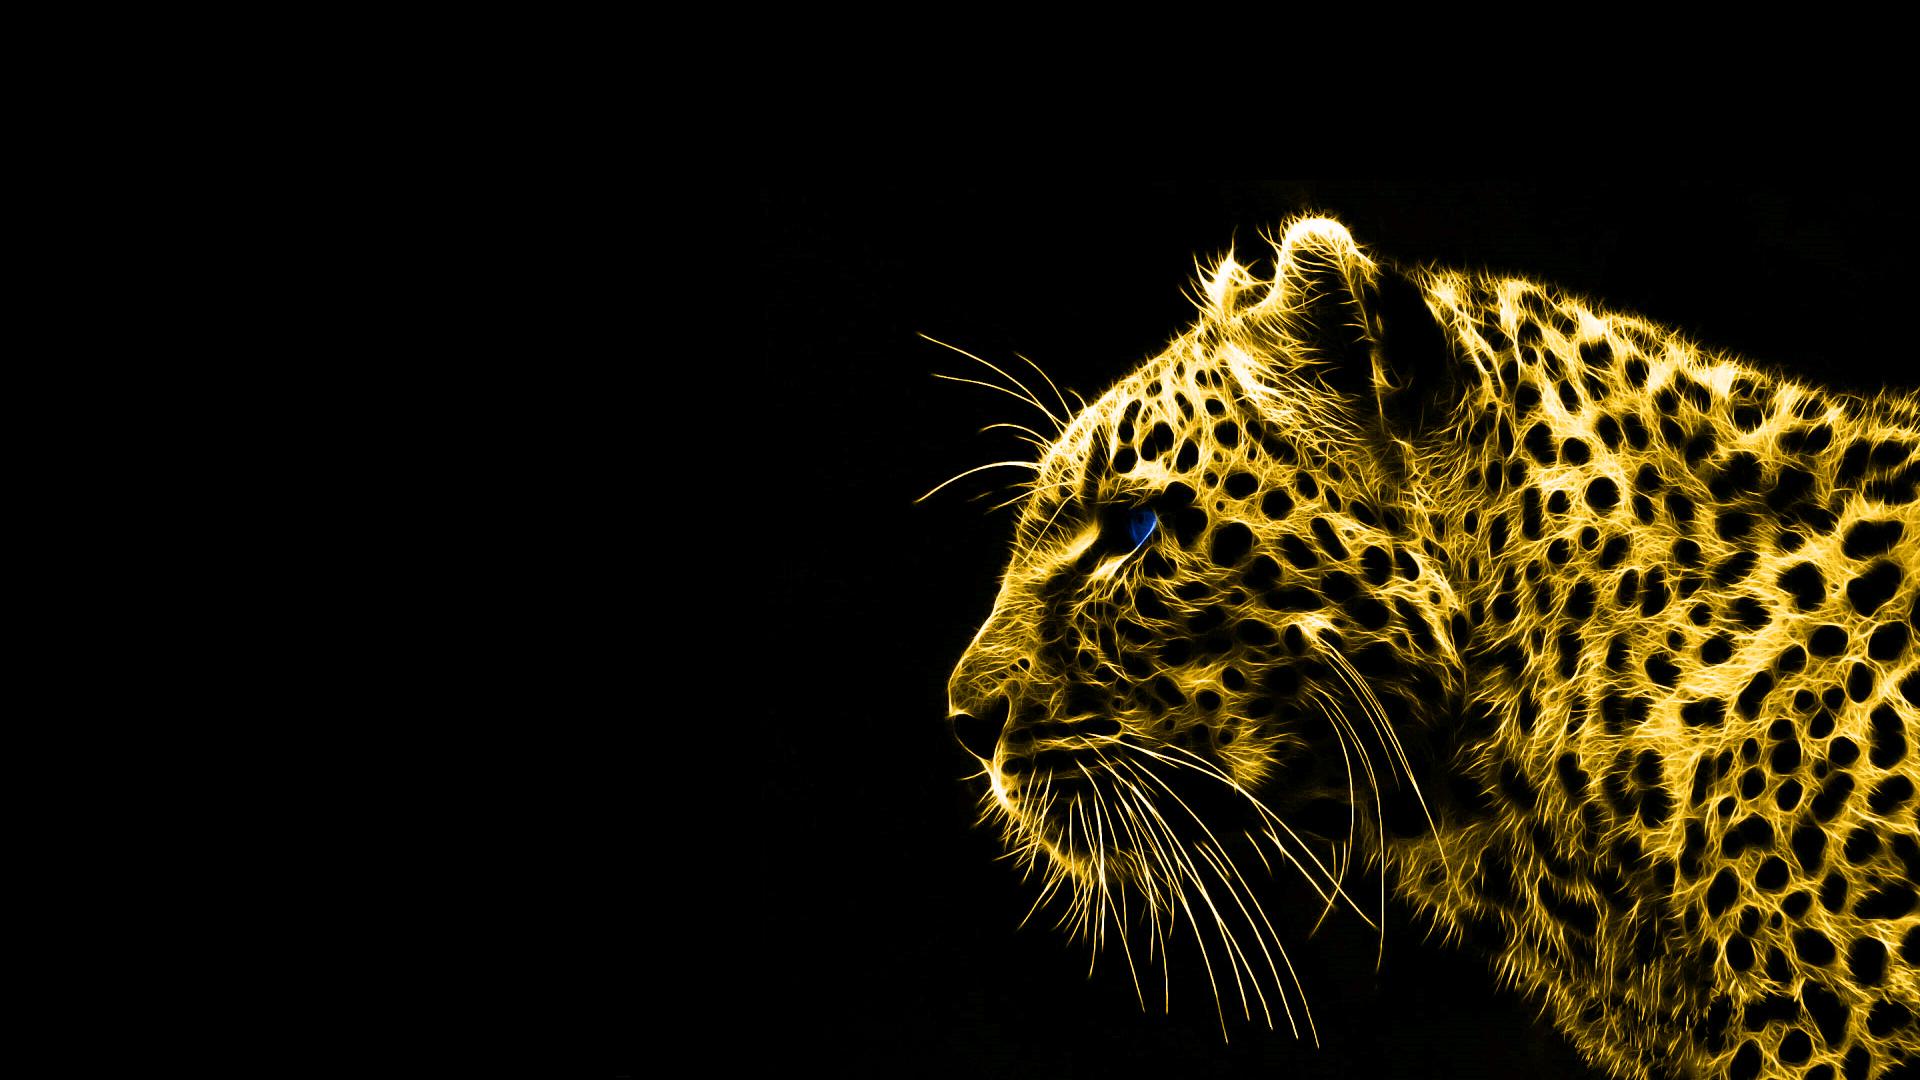 Animals Gold Spirit Leopards Black Background HD Wallpaper HTML Code